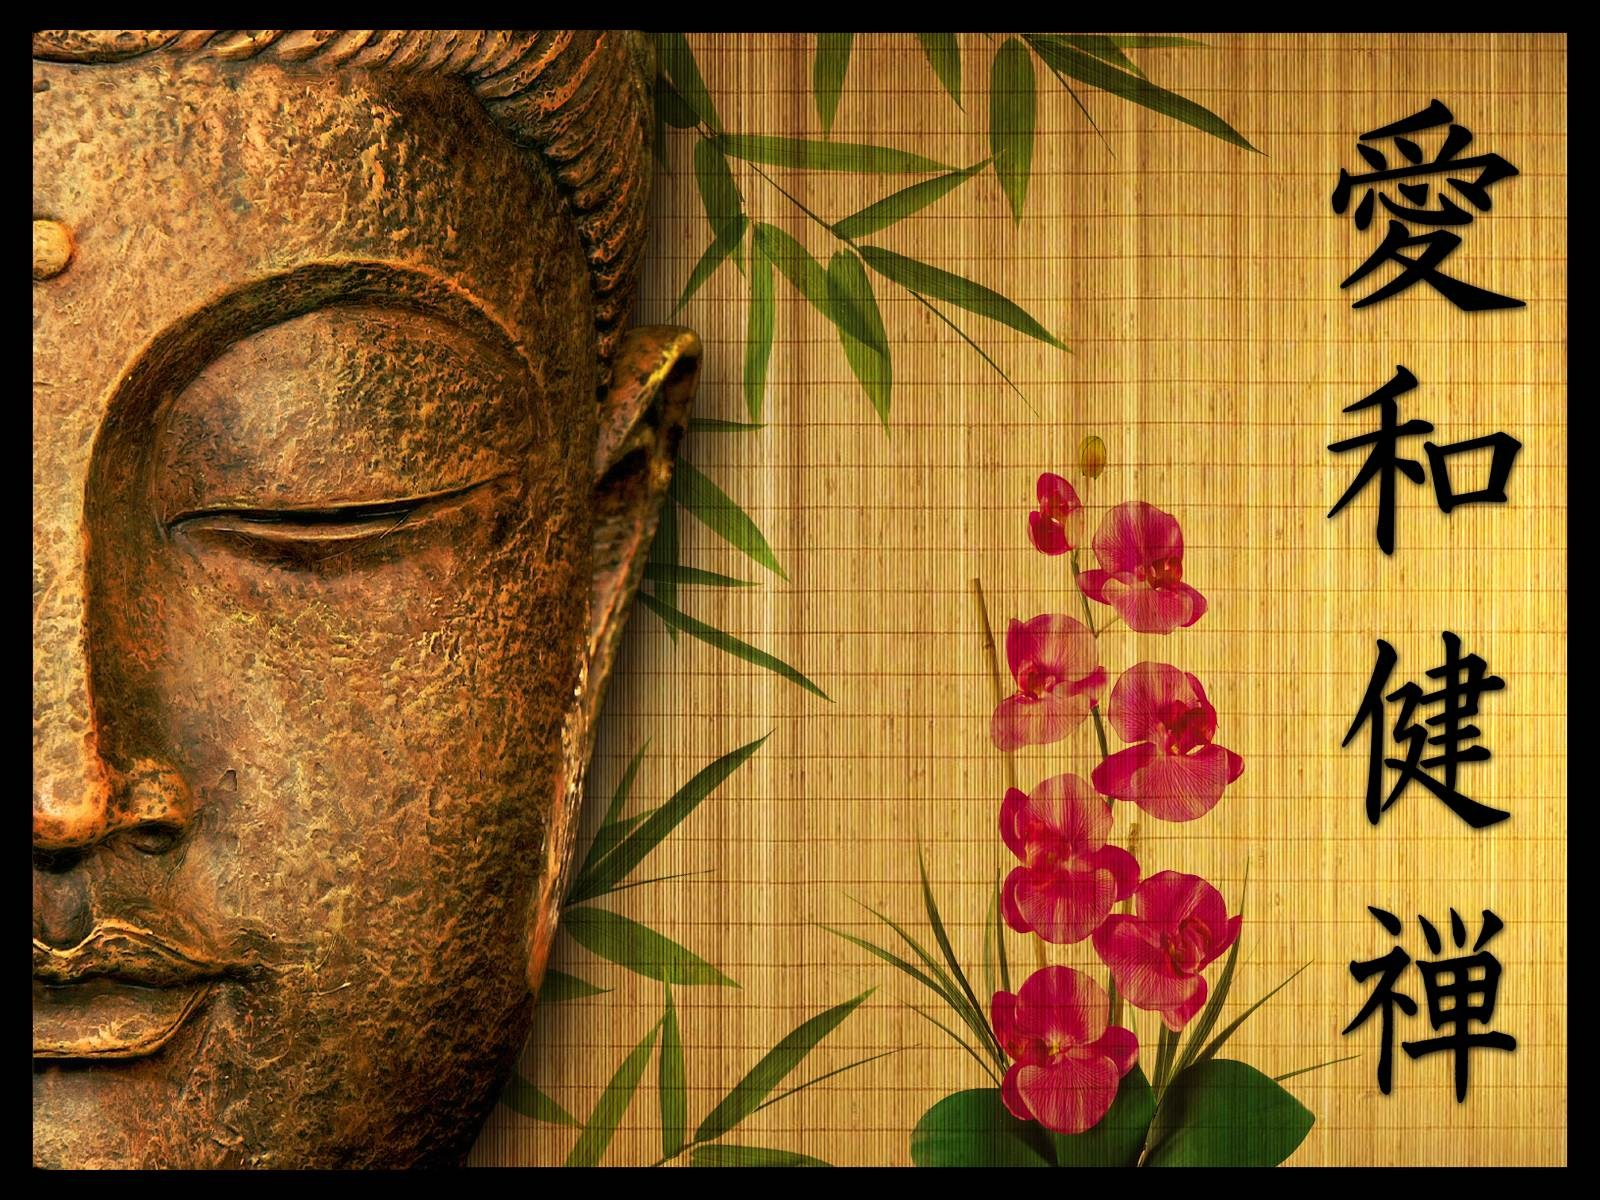 Japanese Zen Buddha